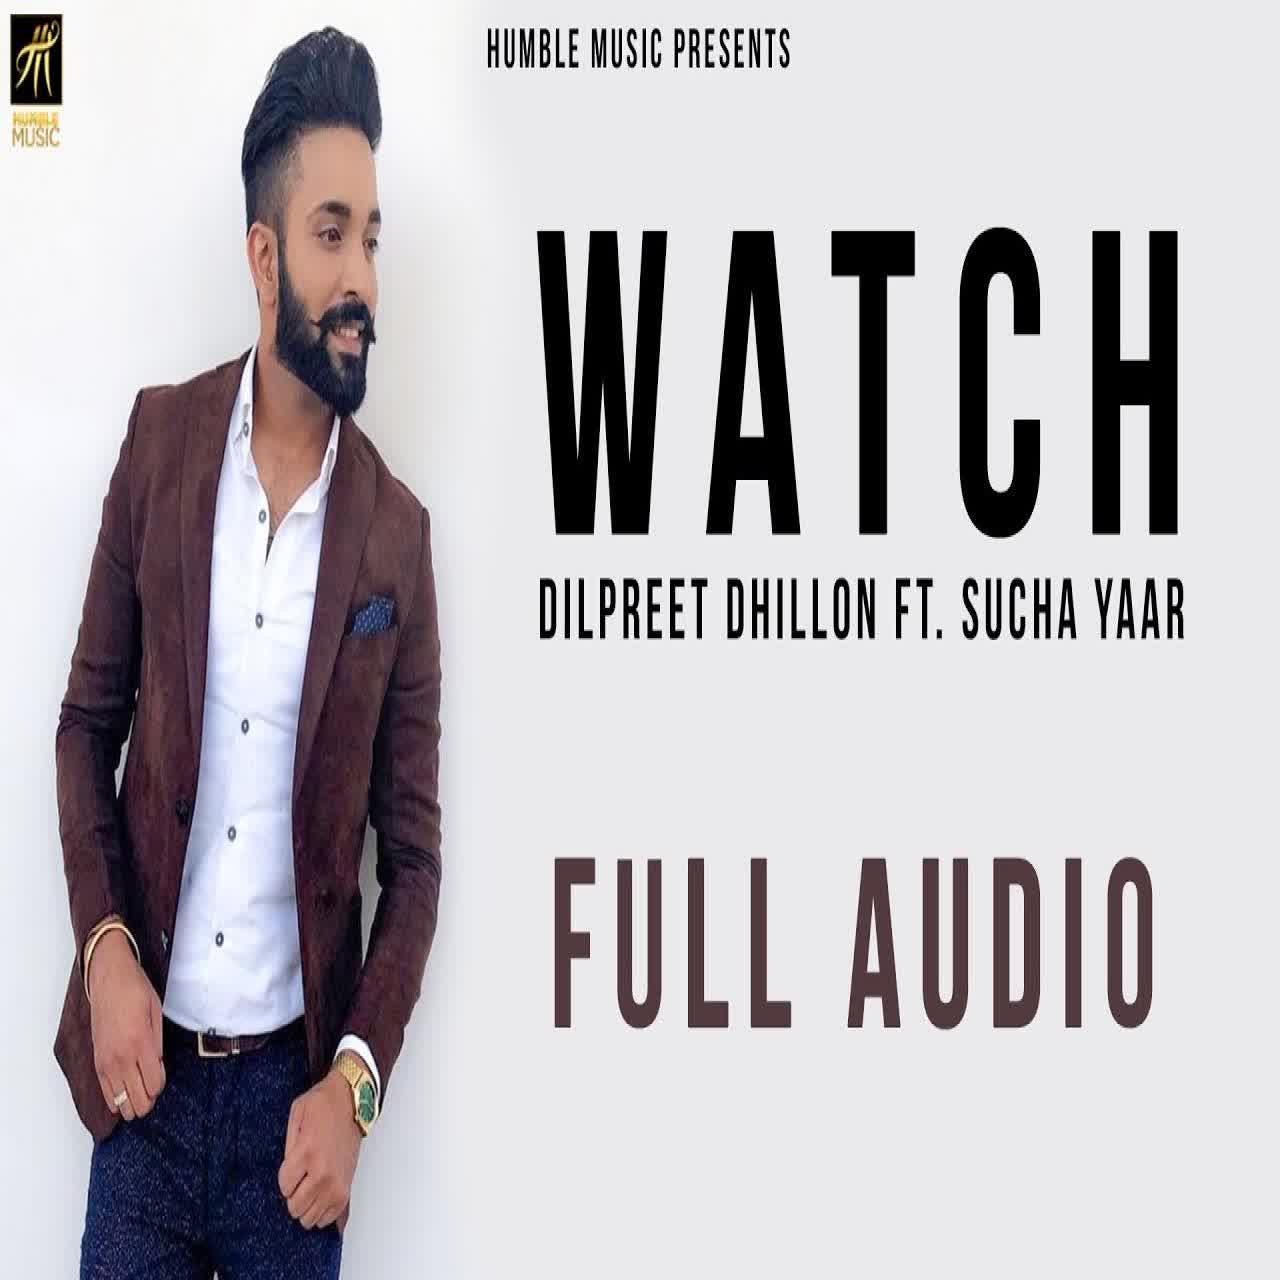 Watch Dilpreet Dhillon